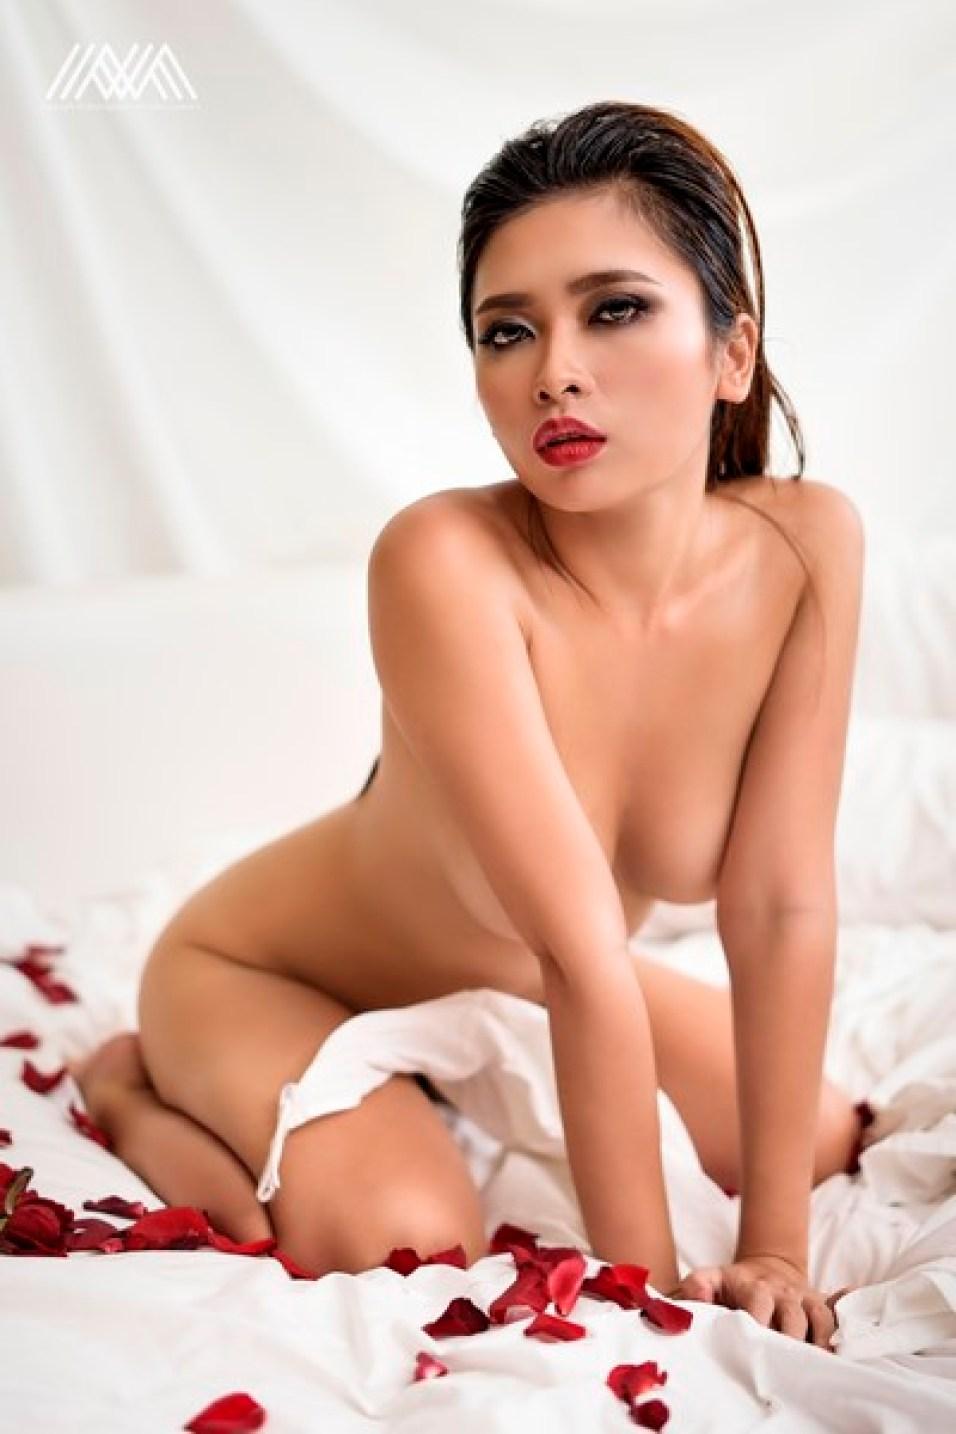 van-ty-ty-dep-hon-trong-bo-anh-vape-cua-photo-max-nguyen (16)